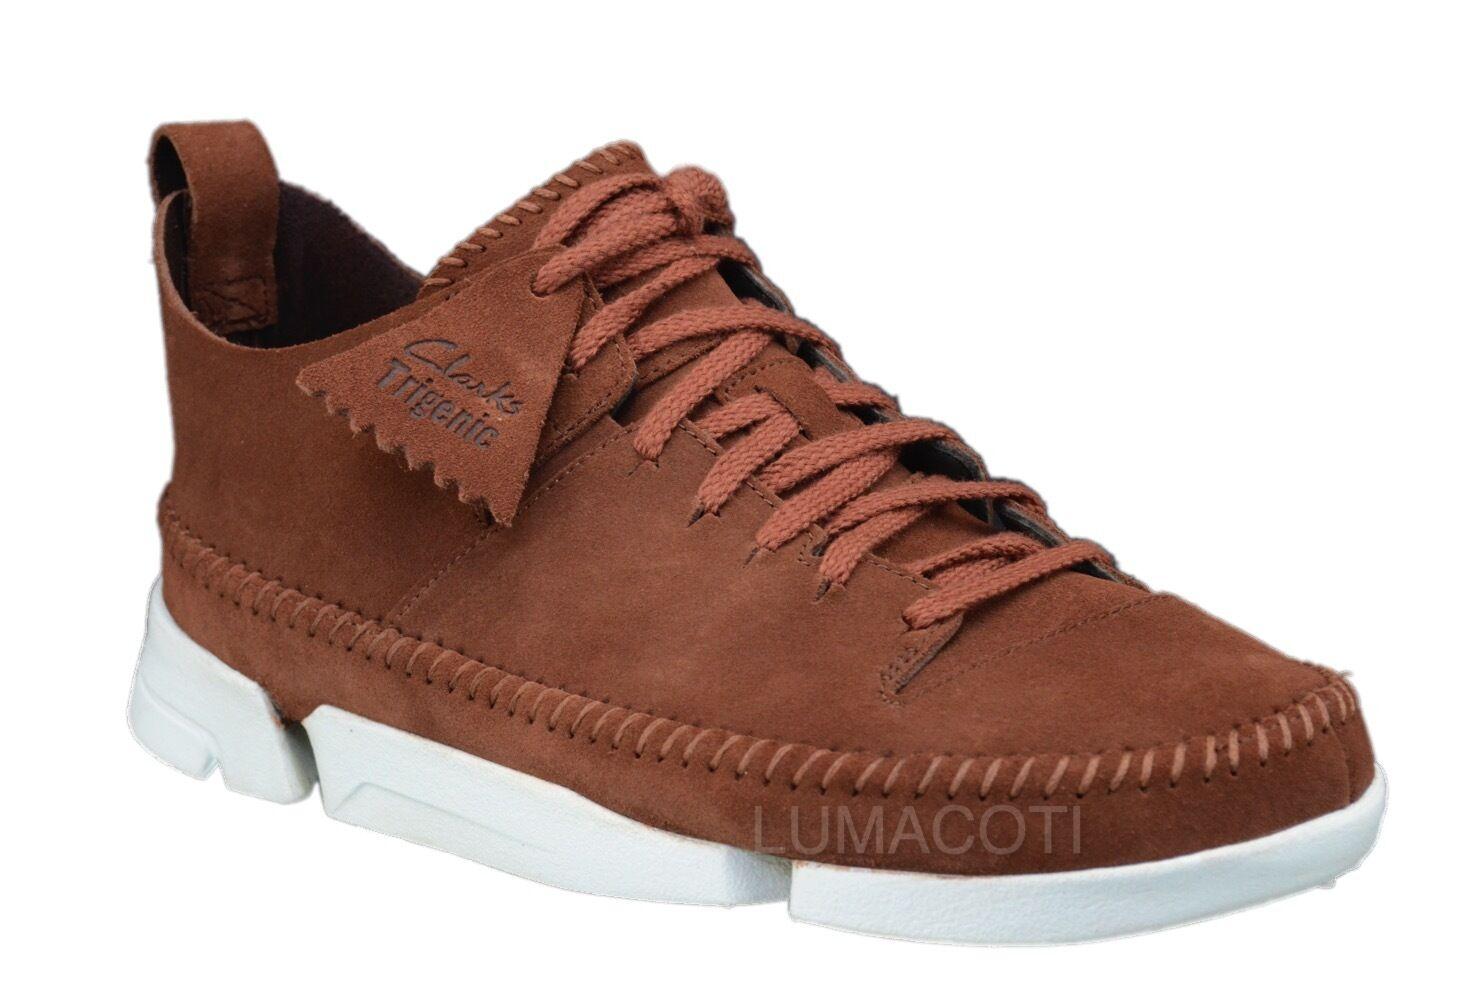 Mens Clarks Originals Trigenic Flex Dark Tan Ankle Boots 26121557